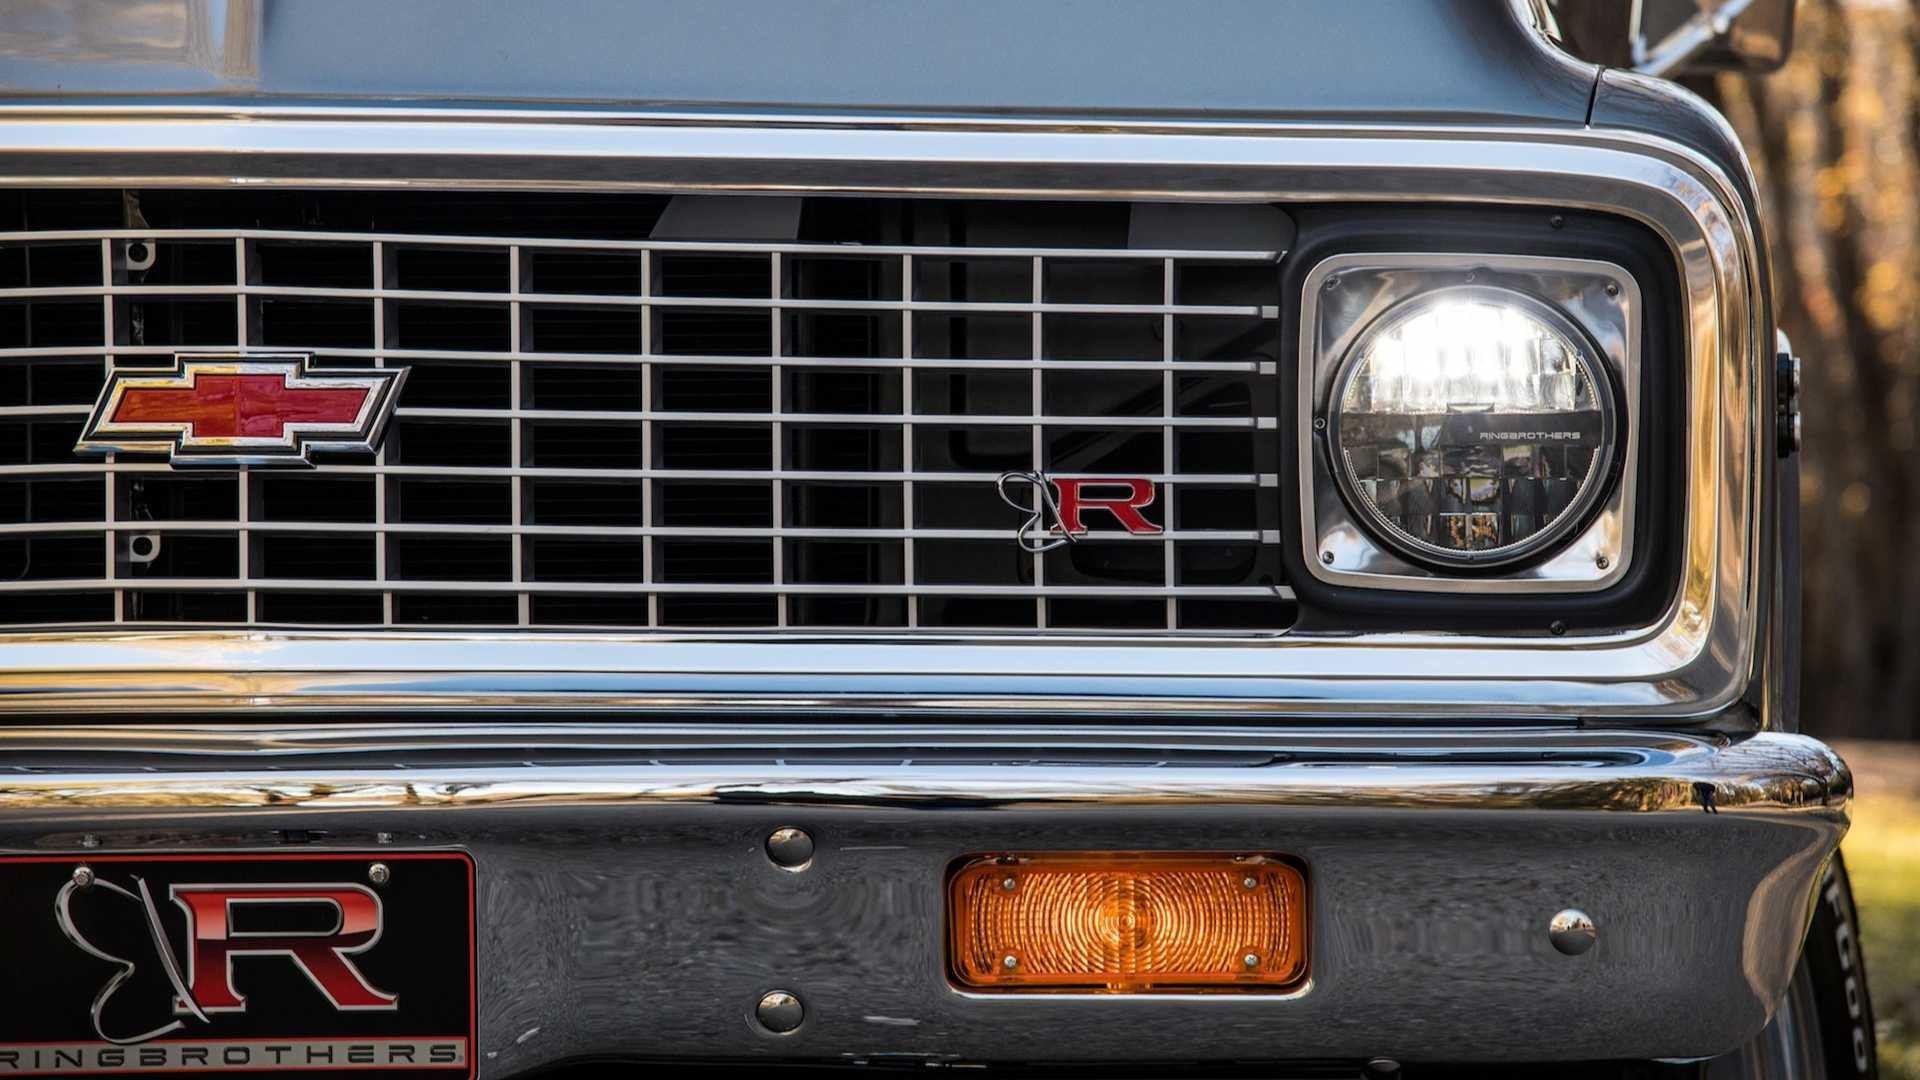 Foto de Ringbrothers Chevrolet K-5 Blazer 1971 (67/73)